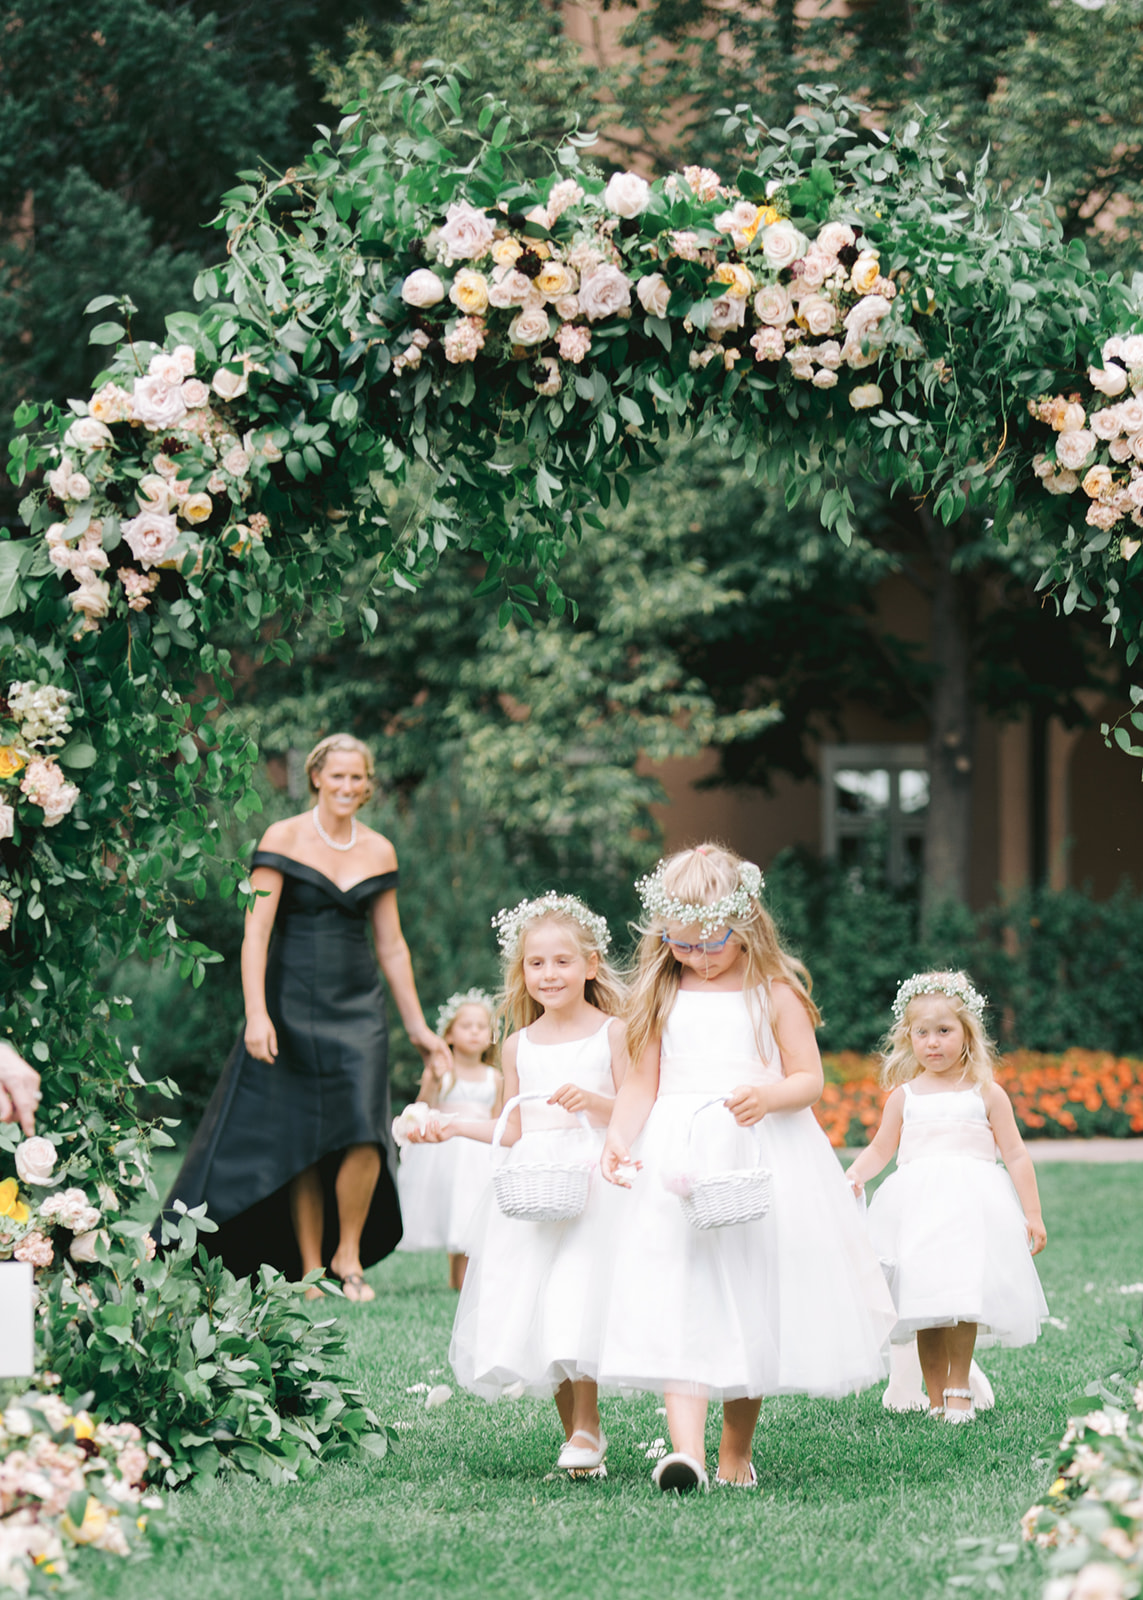 four flower girls walking down aisle throwing petals